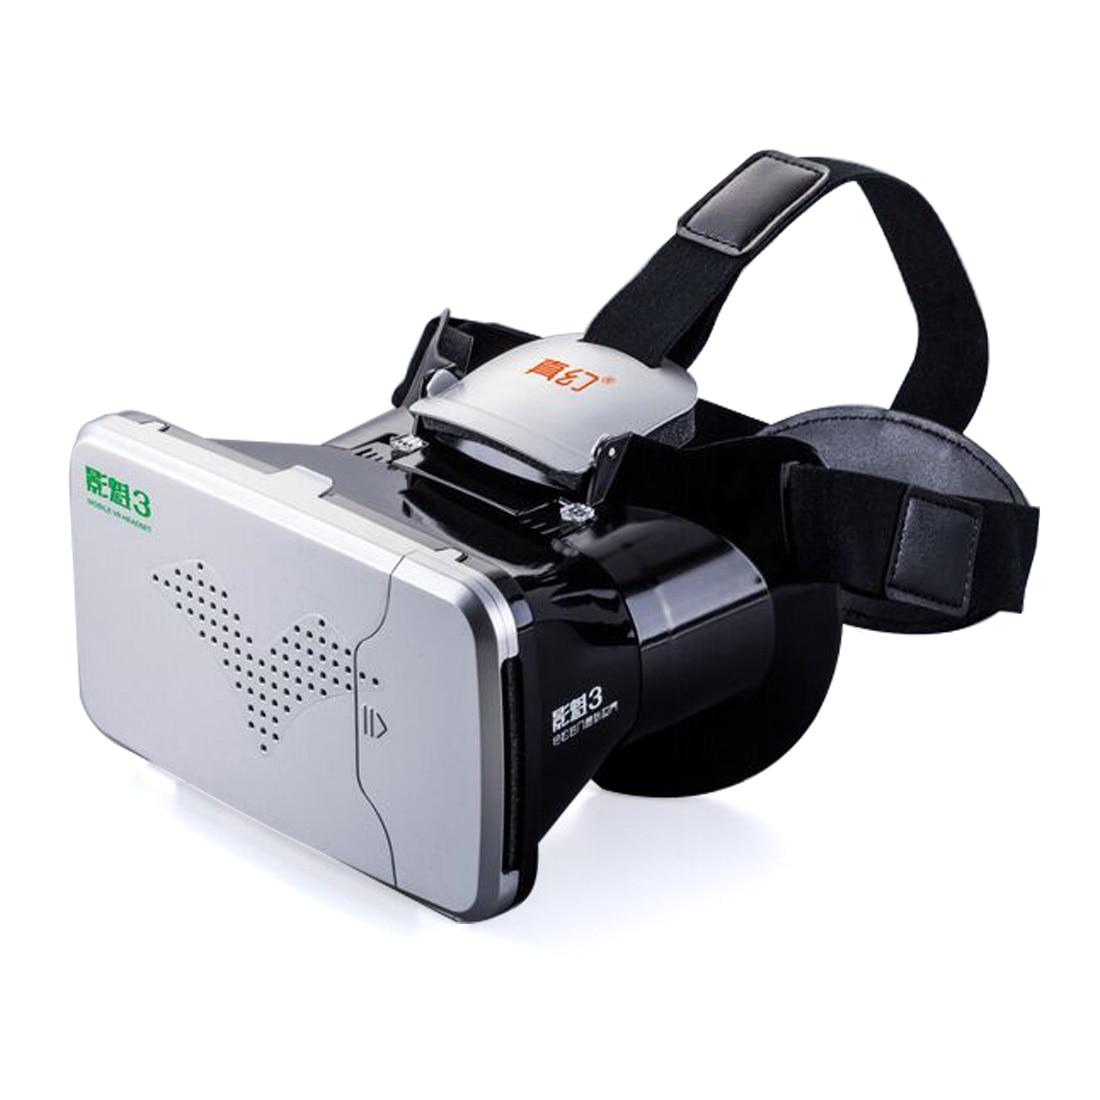 F17698/9 <font><b>RITECH</b></font> III <font><b>RIEM</b></font> <font><b>3</b></font> <font><b>Virtual</b></font> <font><b>Reality</b></font> 3D <font><b>VR</b></font> <font><b>Glasses</b></font> Head Mount Headset Google Cardboard for <font><b>3</b></font>.5-6 inch Smartphone 3D Movie